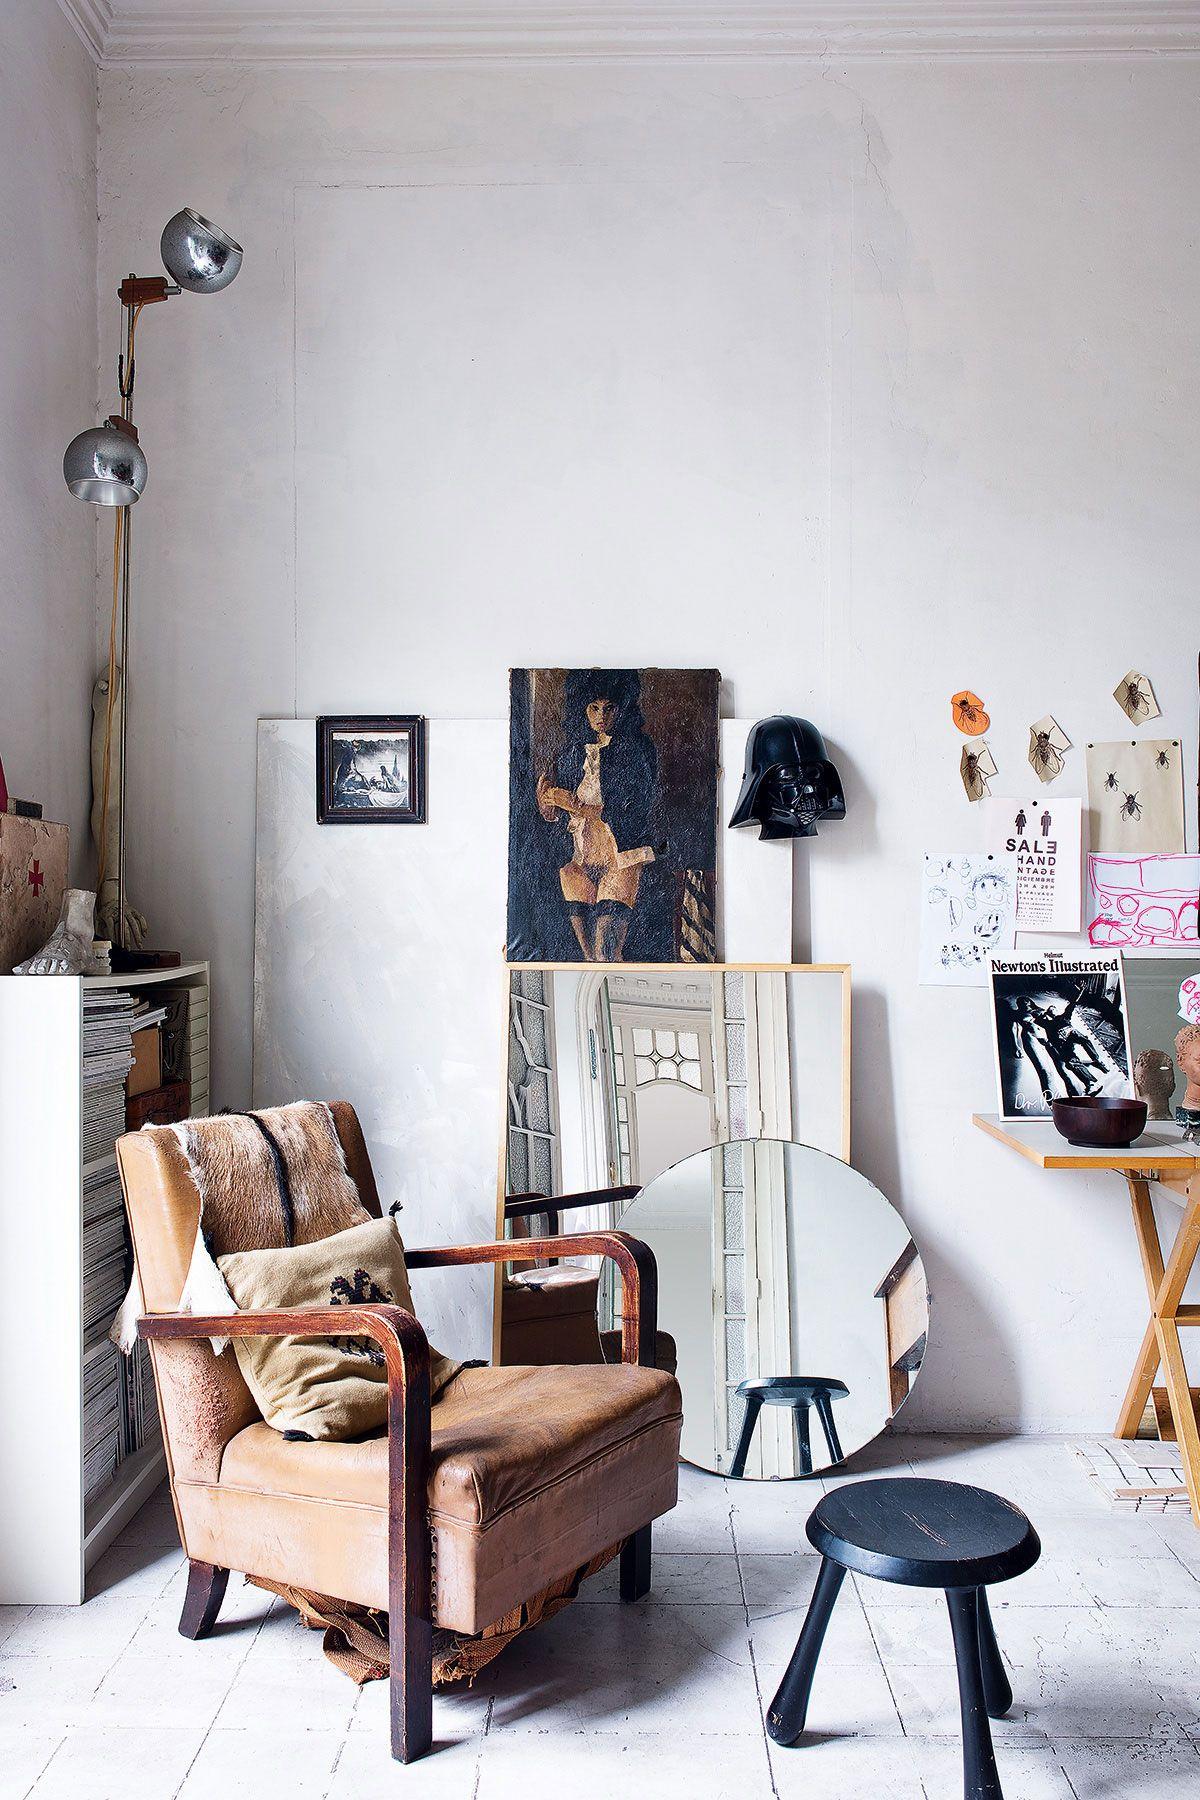 vintage home furnishing inspiration via architectural digest españa ...